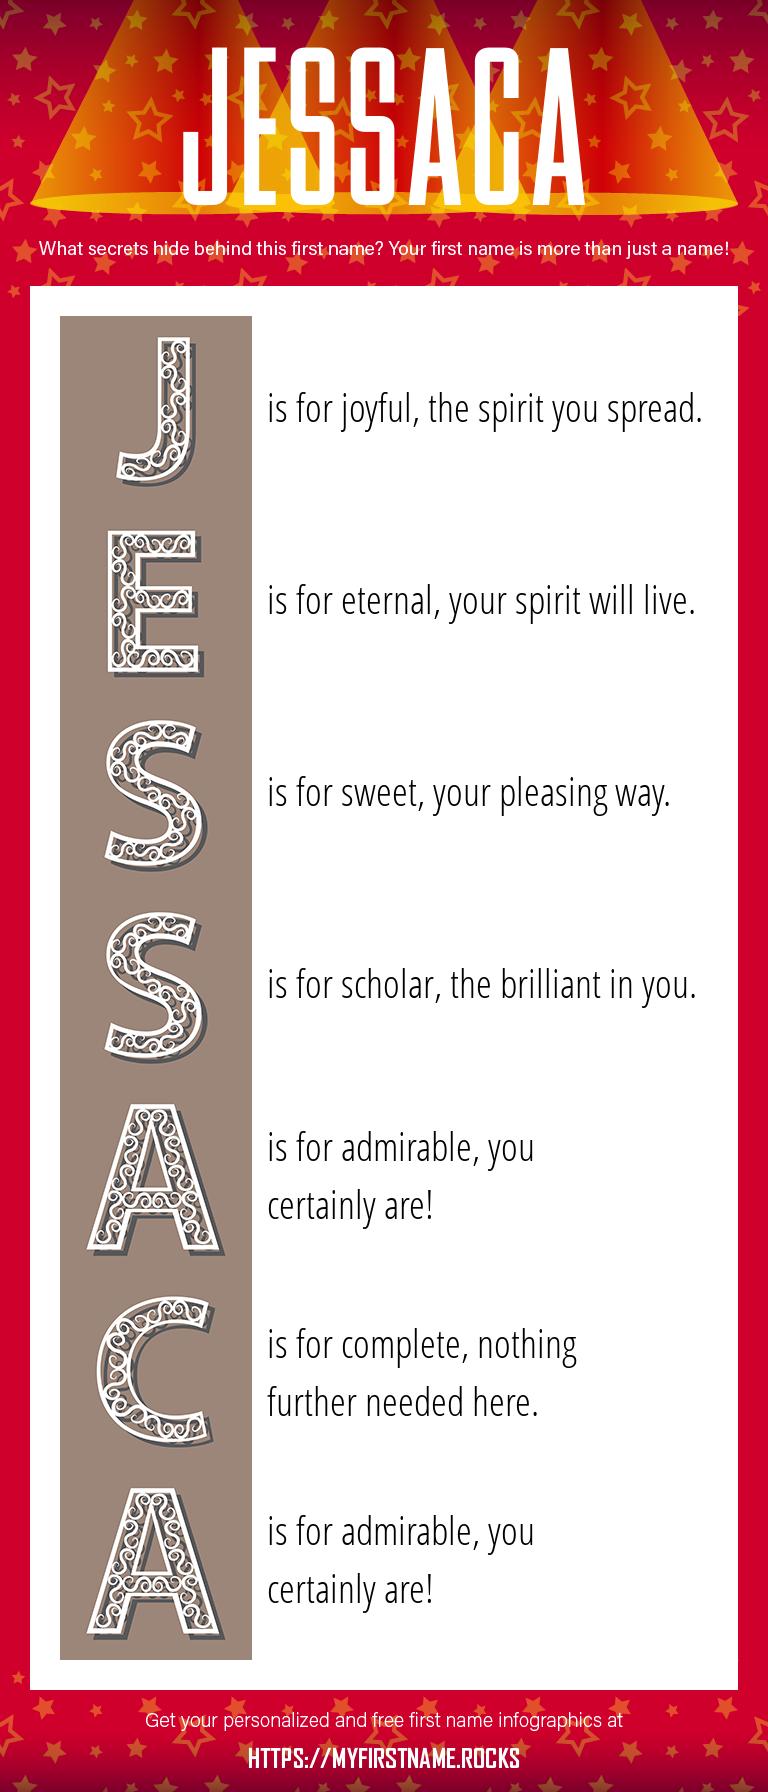 Jessaca Infographics